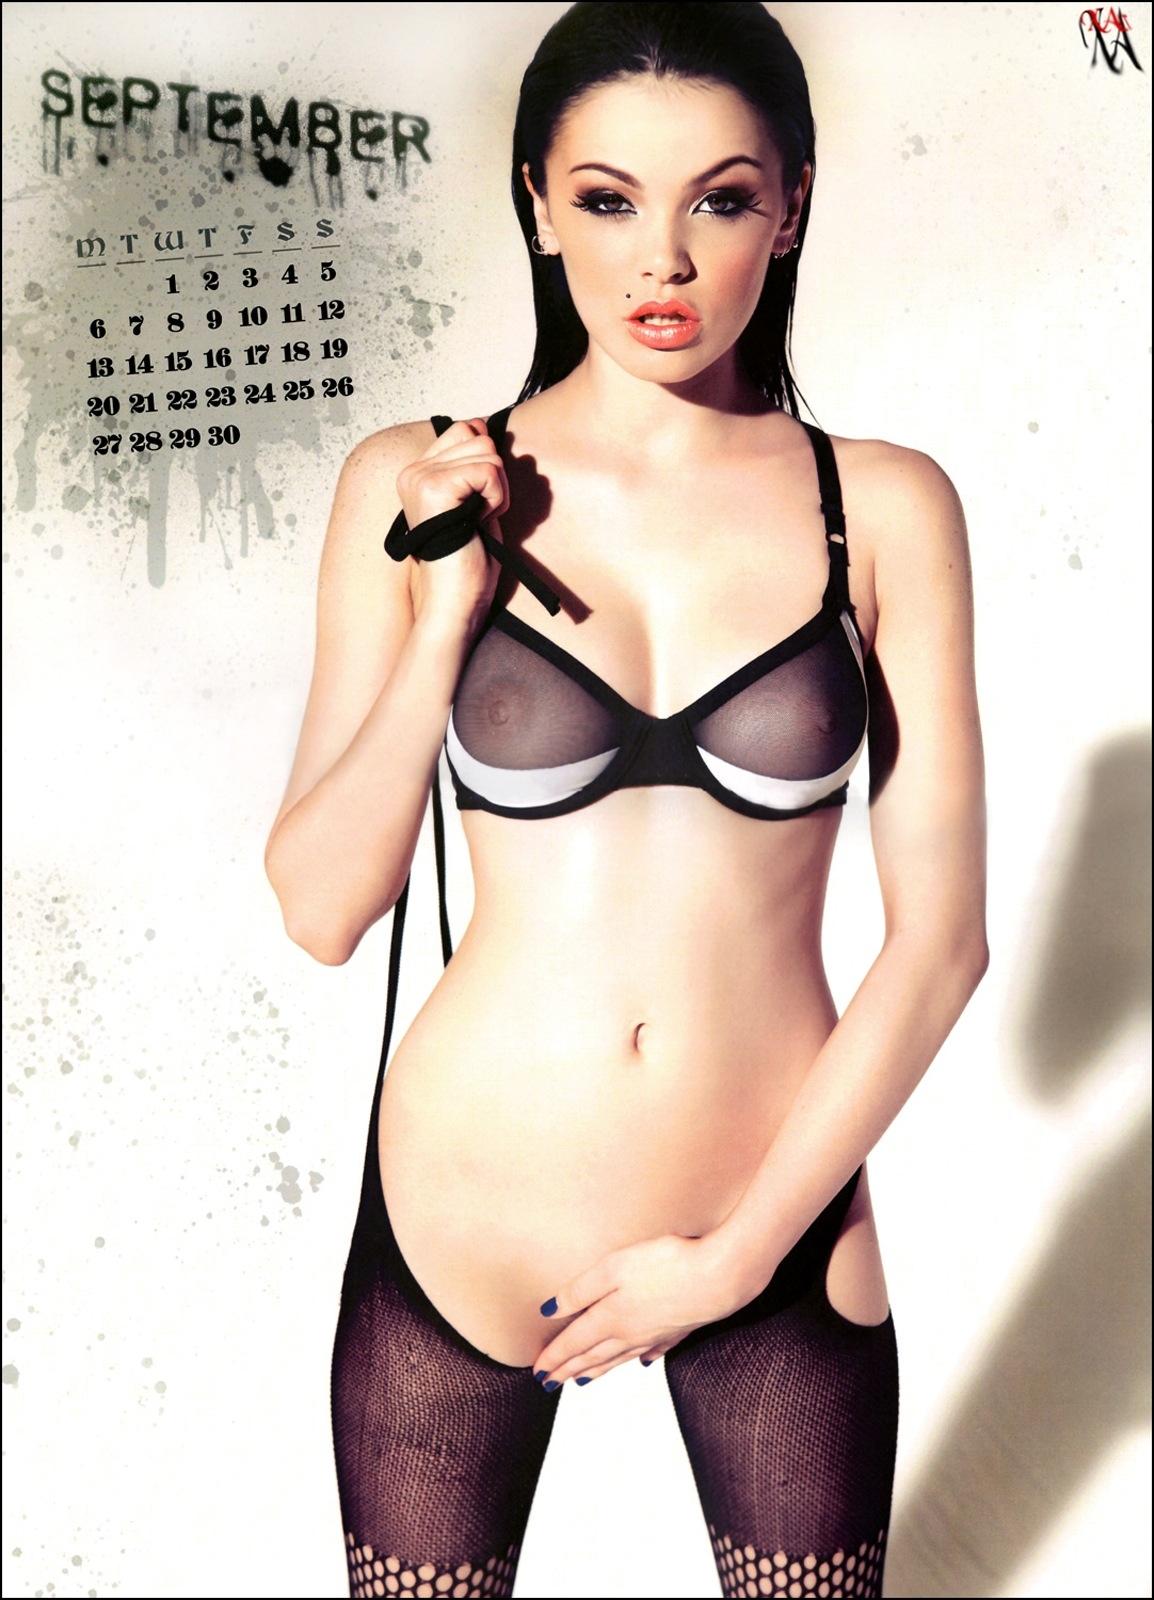 Vikki blows nude pics